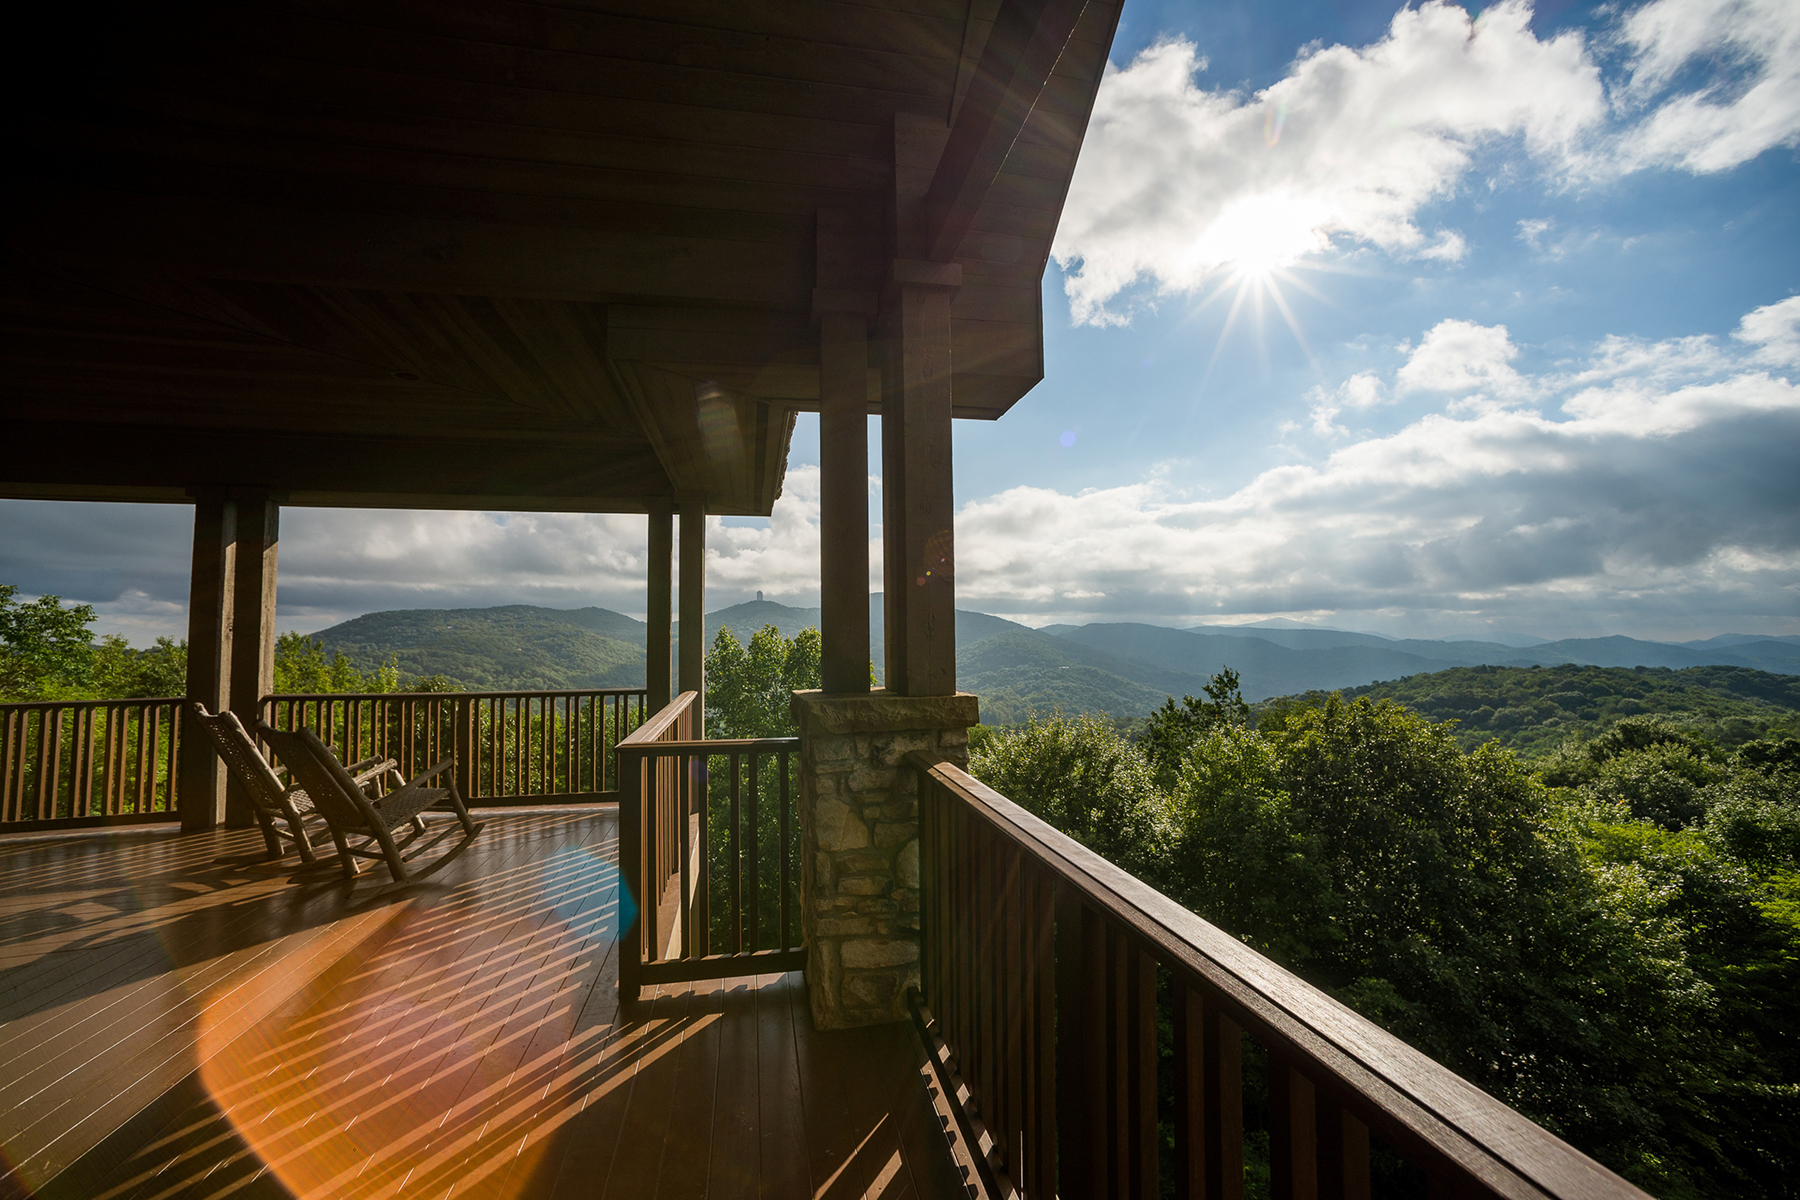 Single Family Homes for Sale at BANNER ELK - DIAMOND CREEK 767 Turks Cap Banner Elk, North Carolina 28604 United States